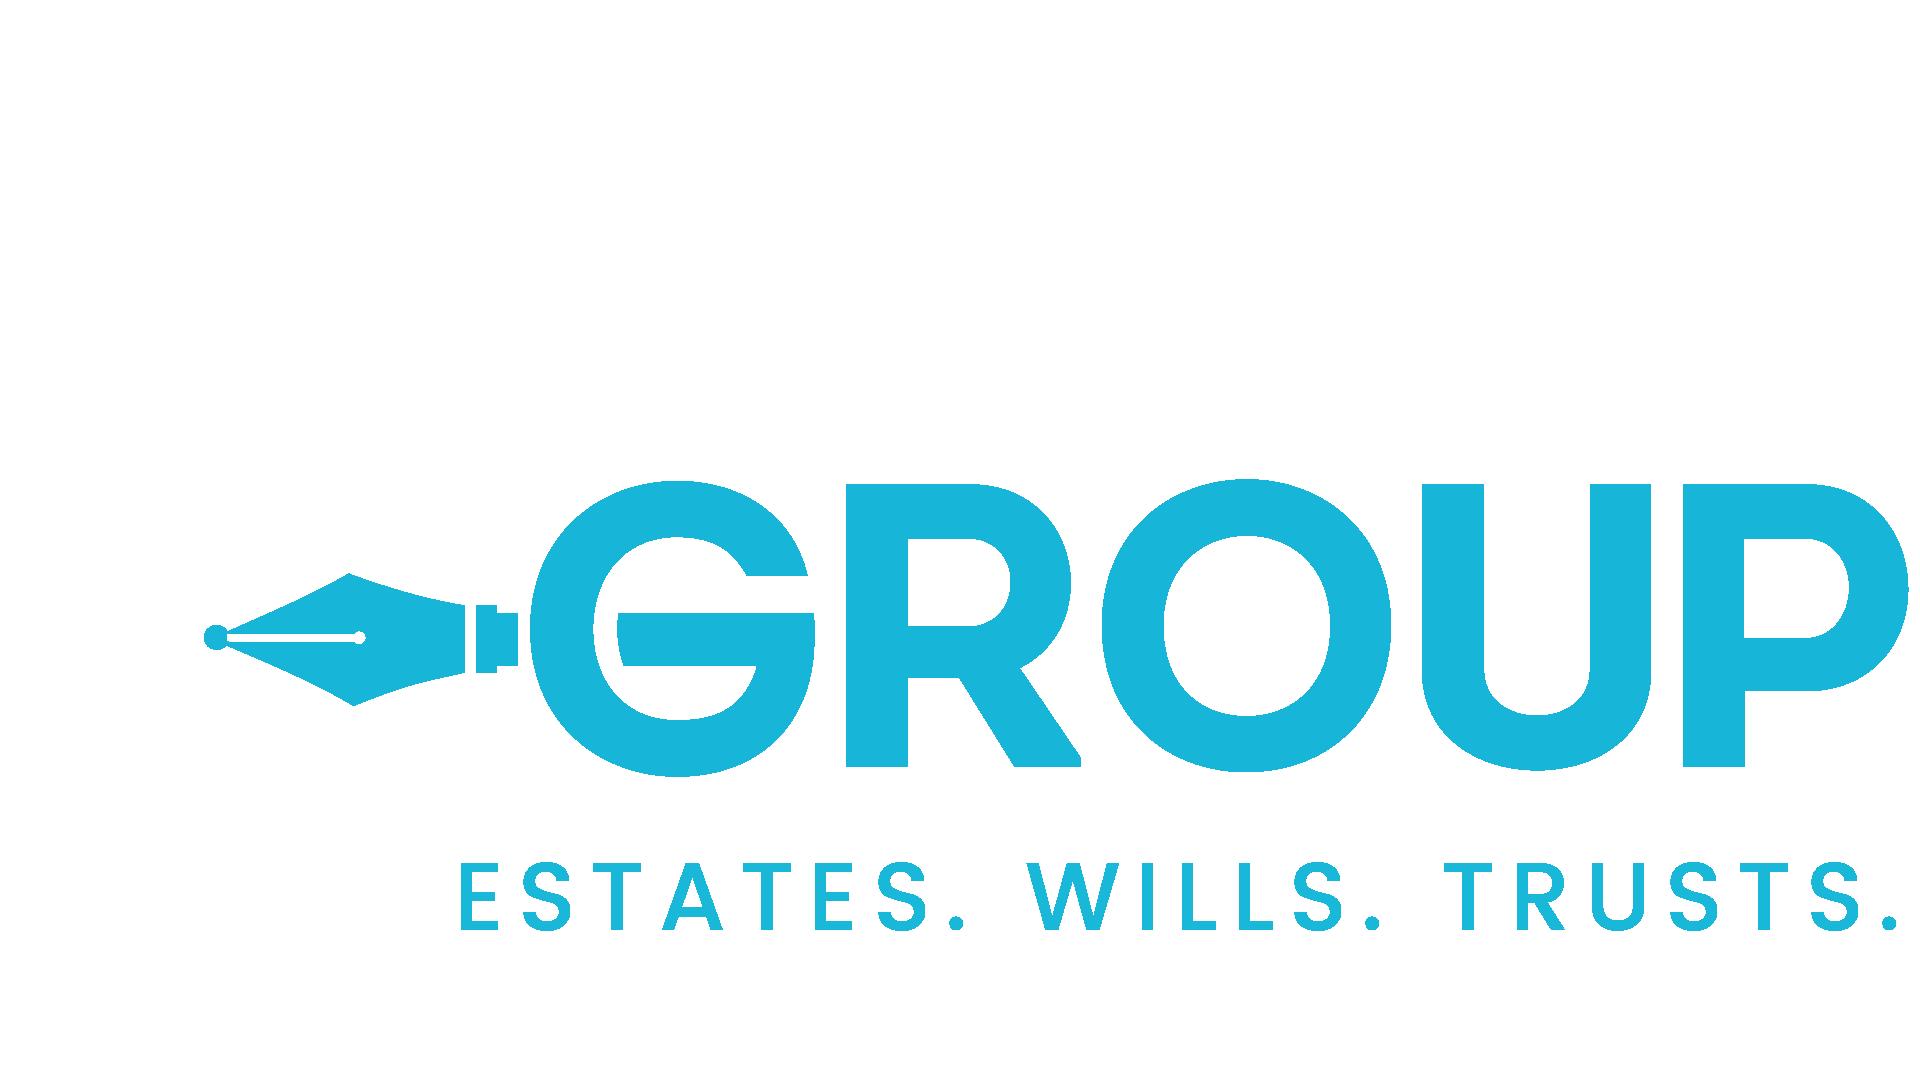 Dakroub Group